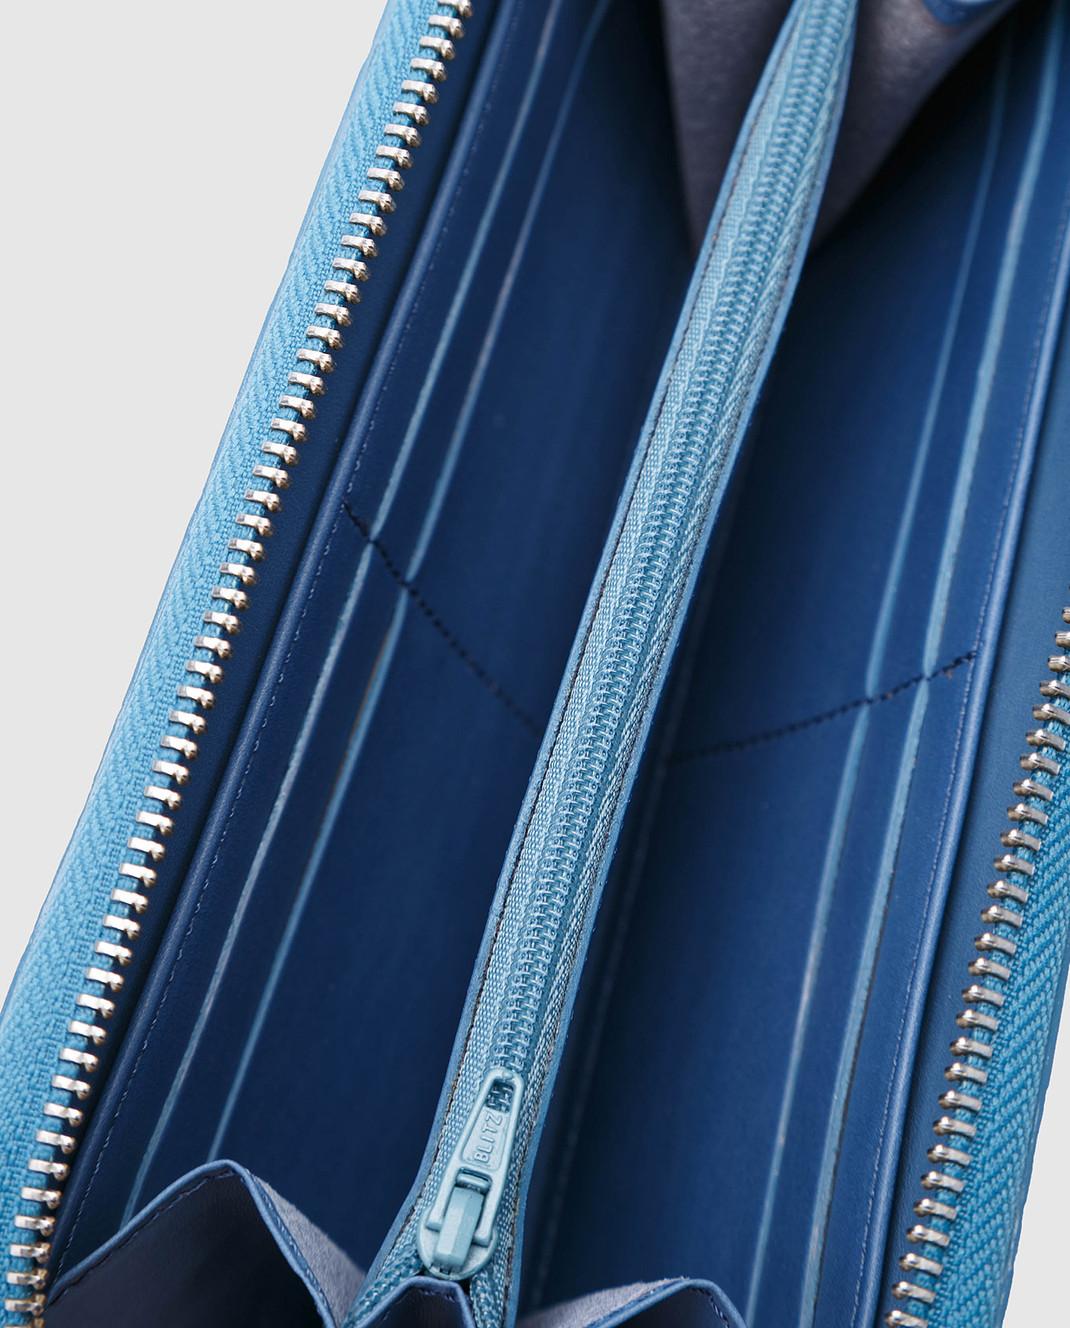 Bochicchio Голубой кожаный кошелек изображение 4